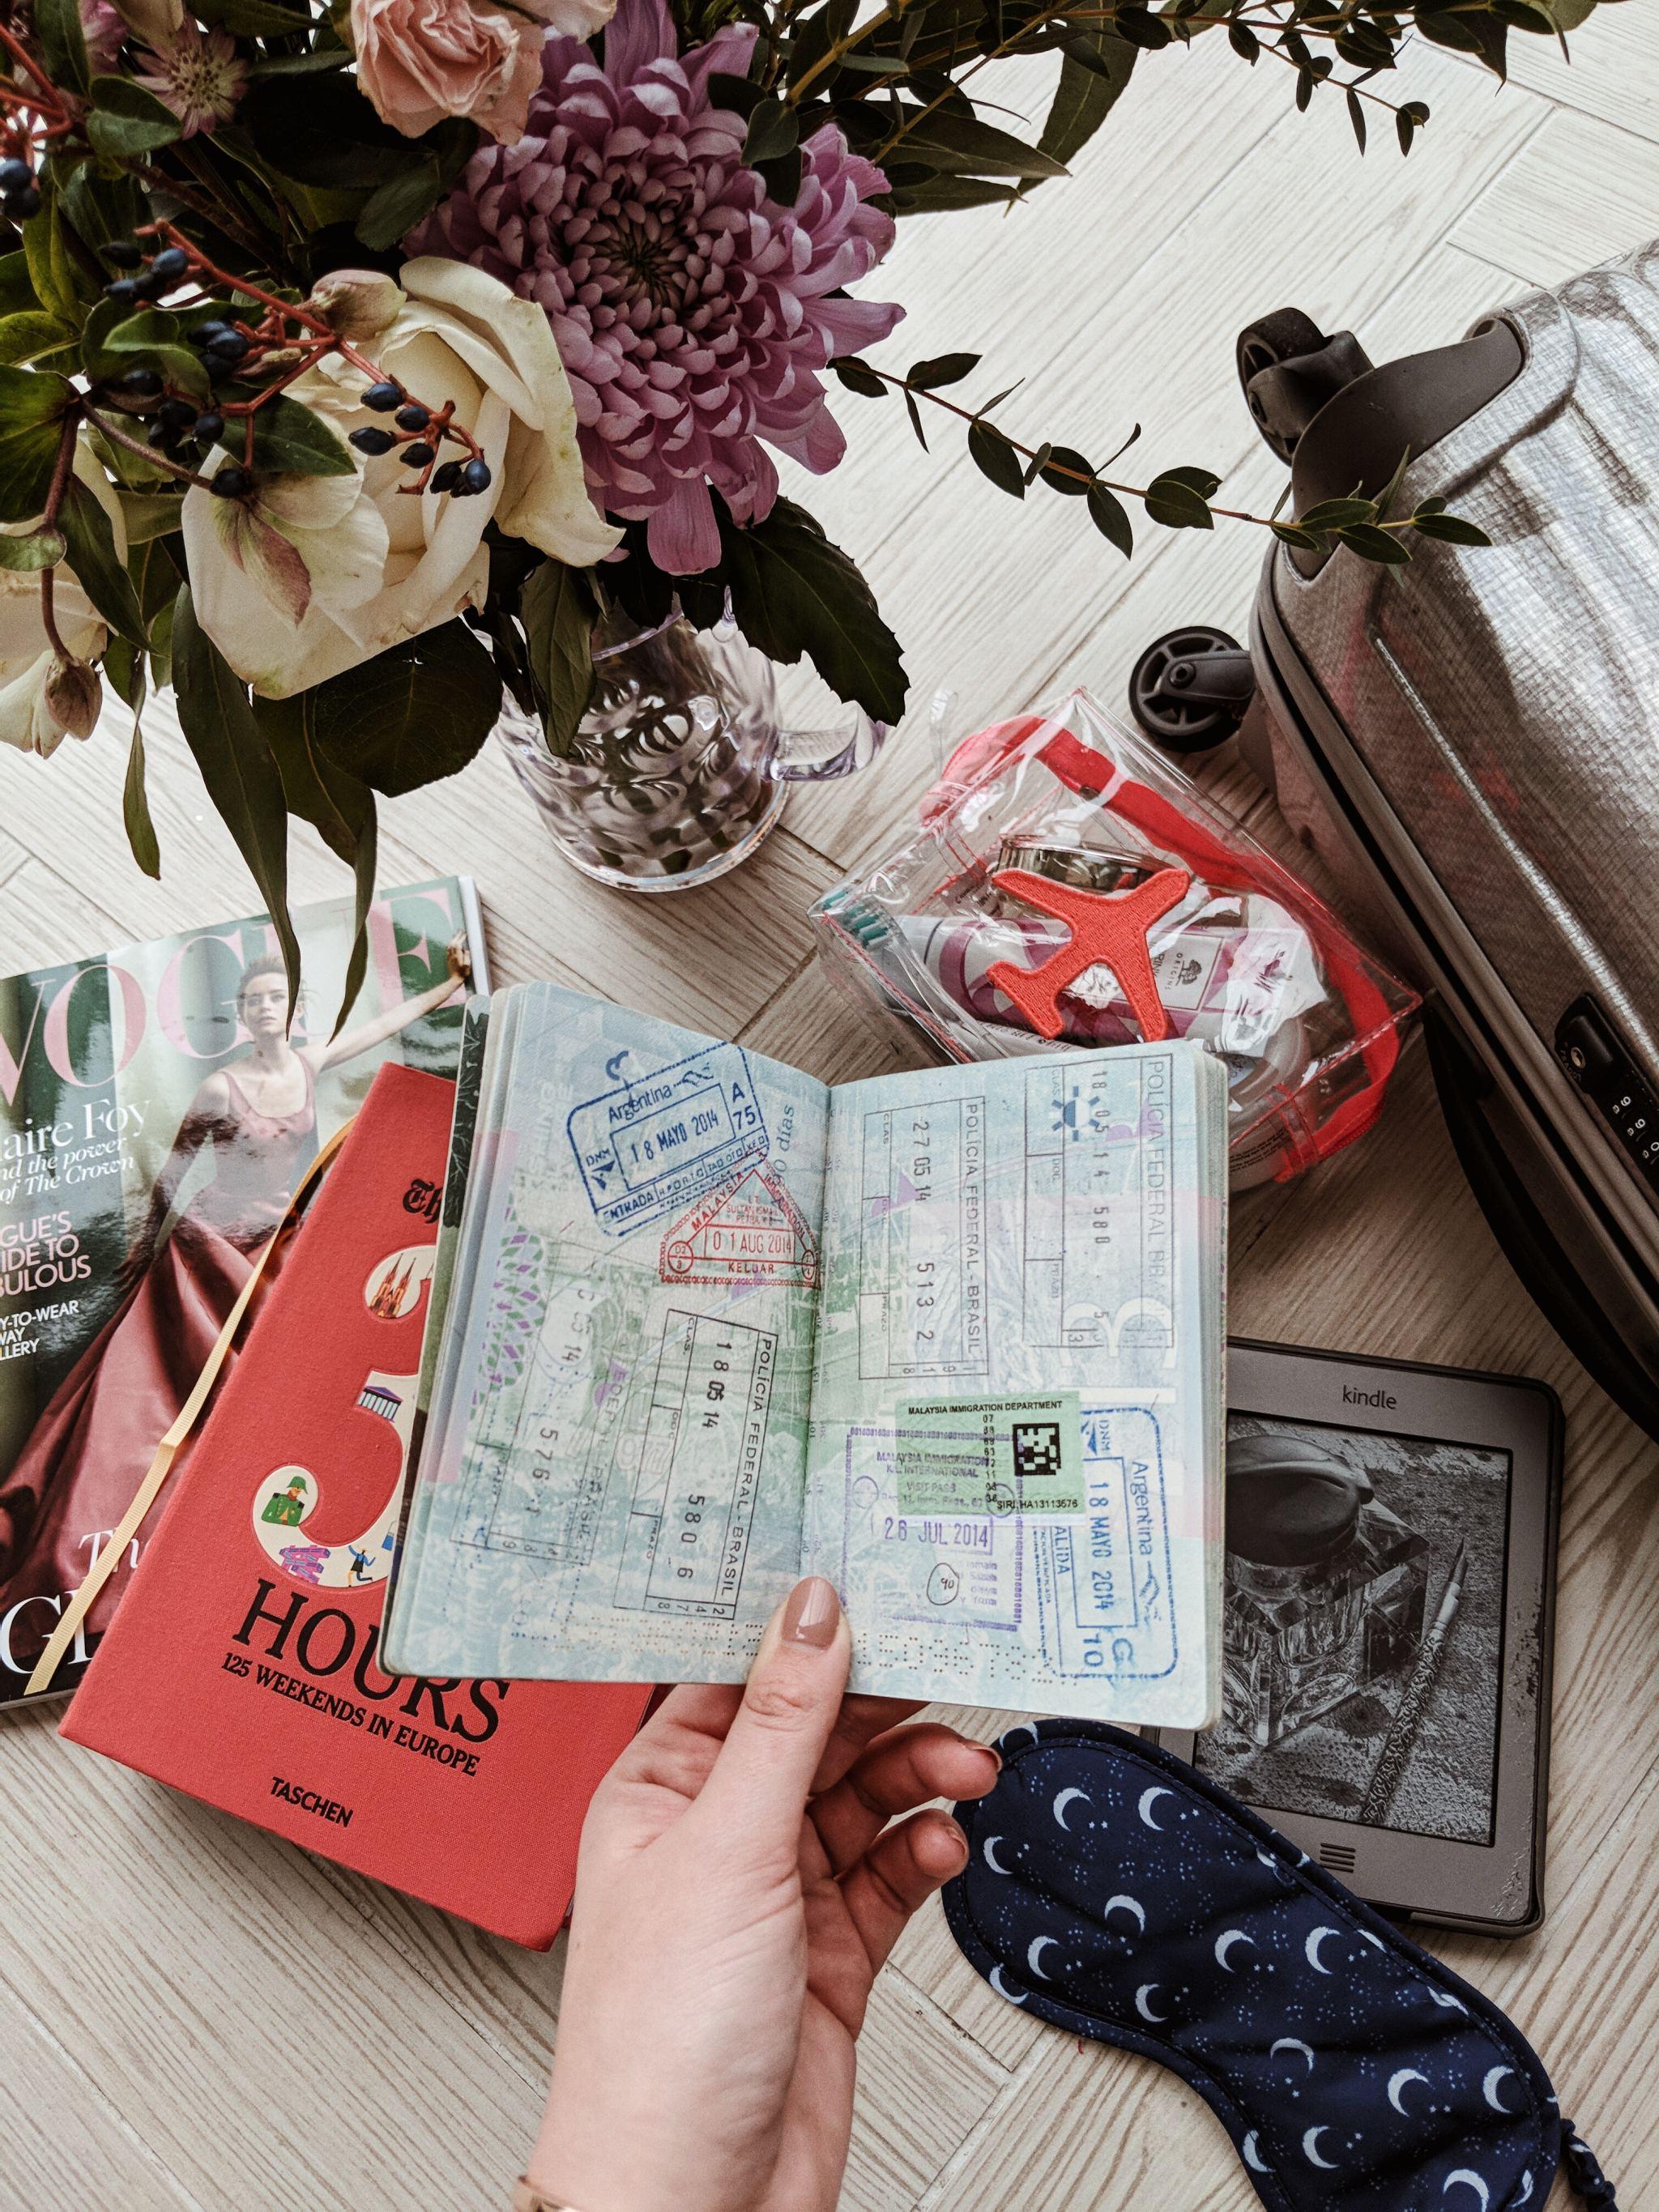 heathrow airport travel passport cocoachelsea travelling caleb femi